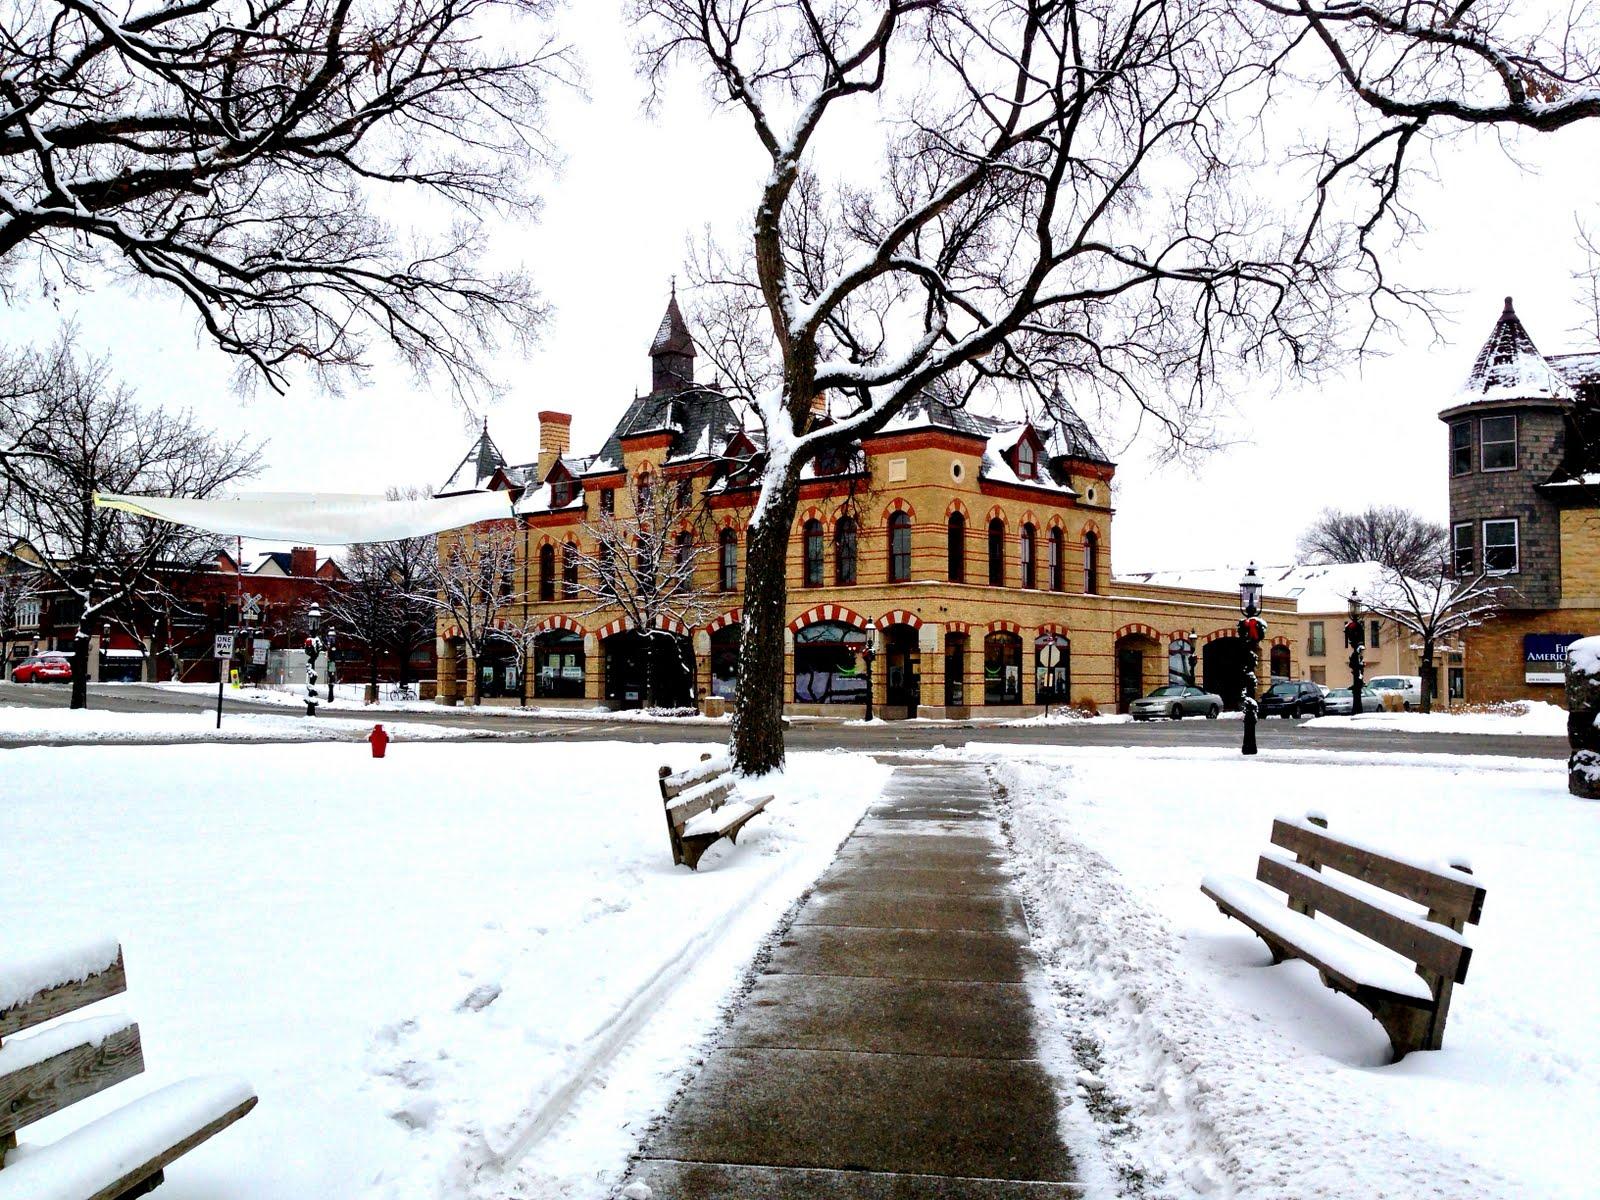 Riverside Illinois Christmastime In Riverside